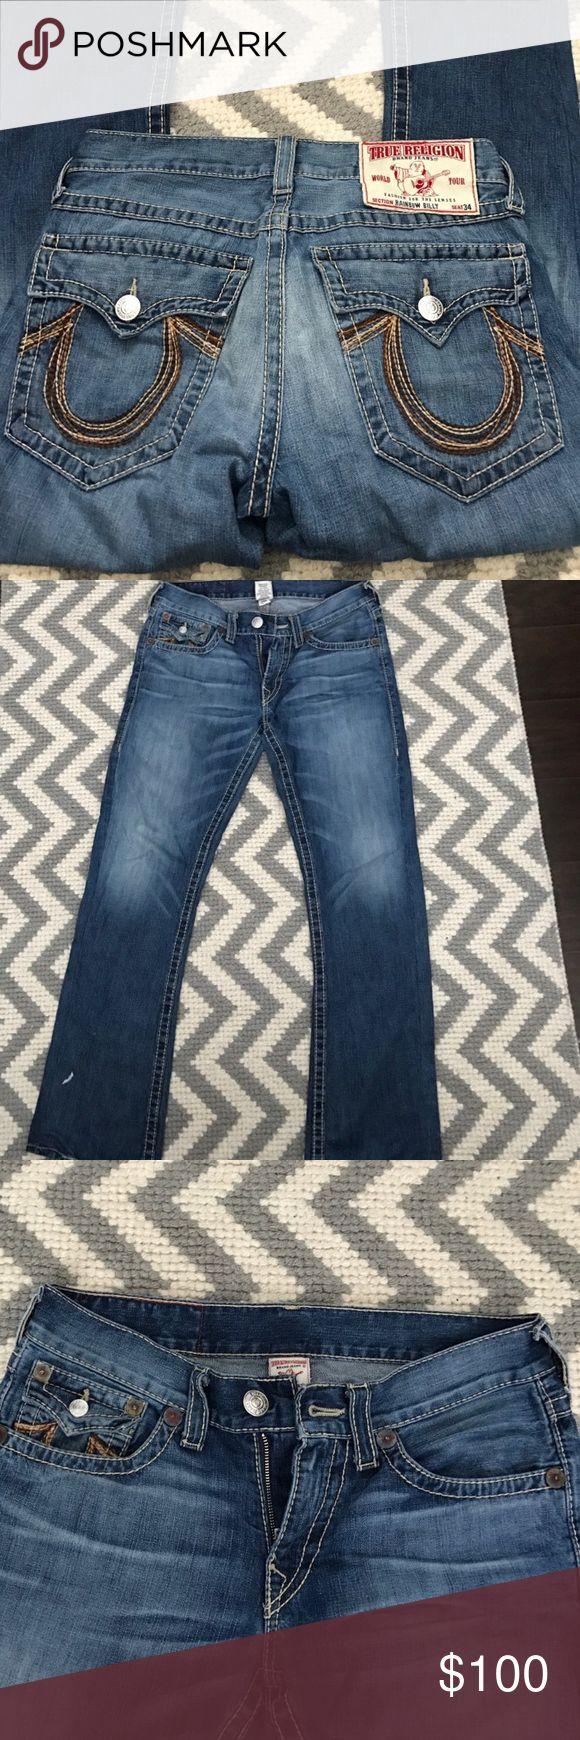 True Religion Men's Jeans Size 33 True Religion Men's Jeans Size 33 True Religion Jeans